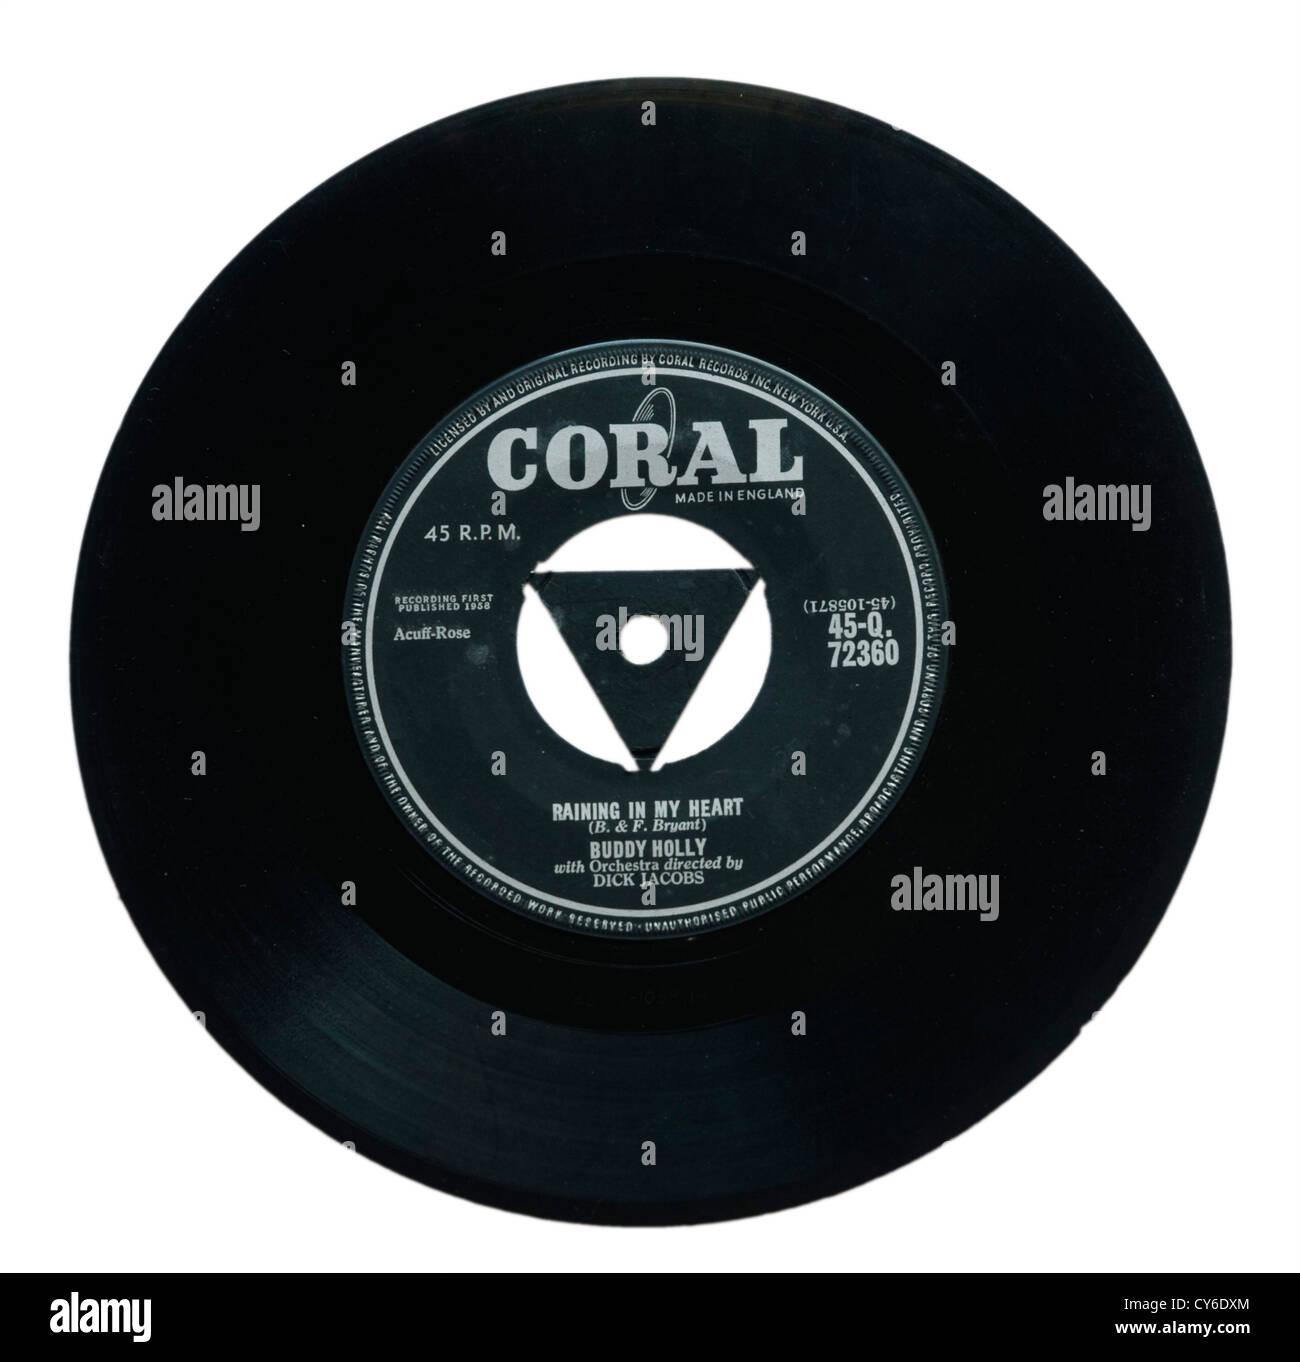 Buddy Holly Raining in my Heart single - Stock Image